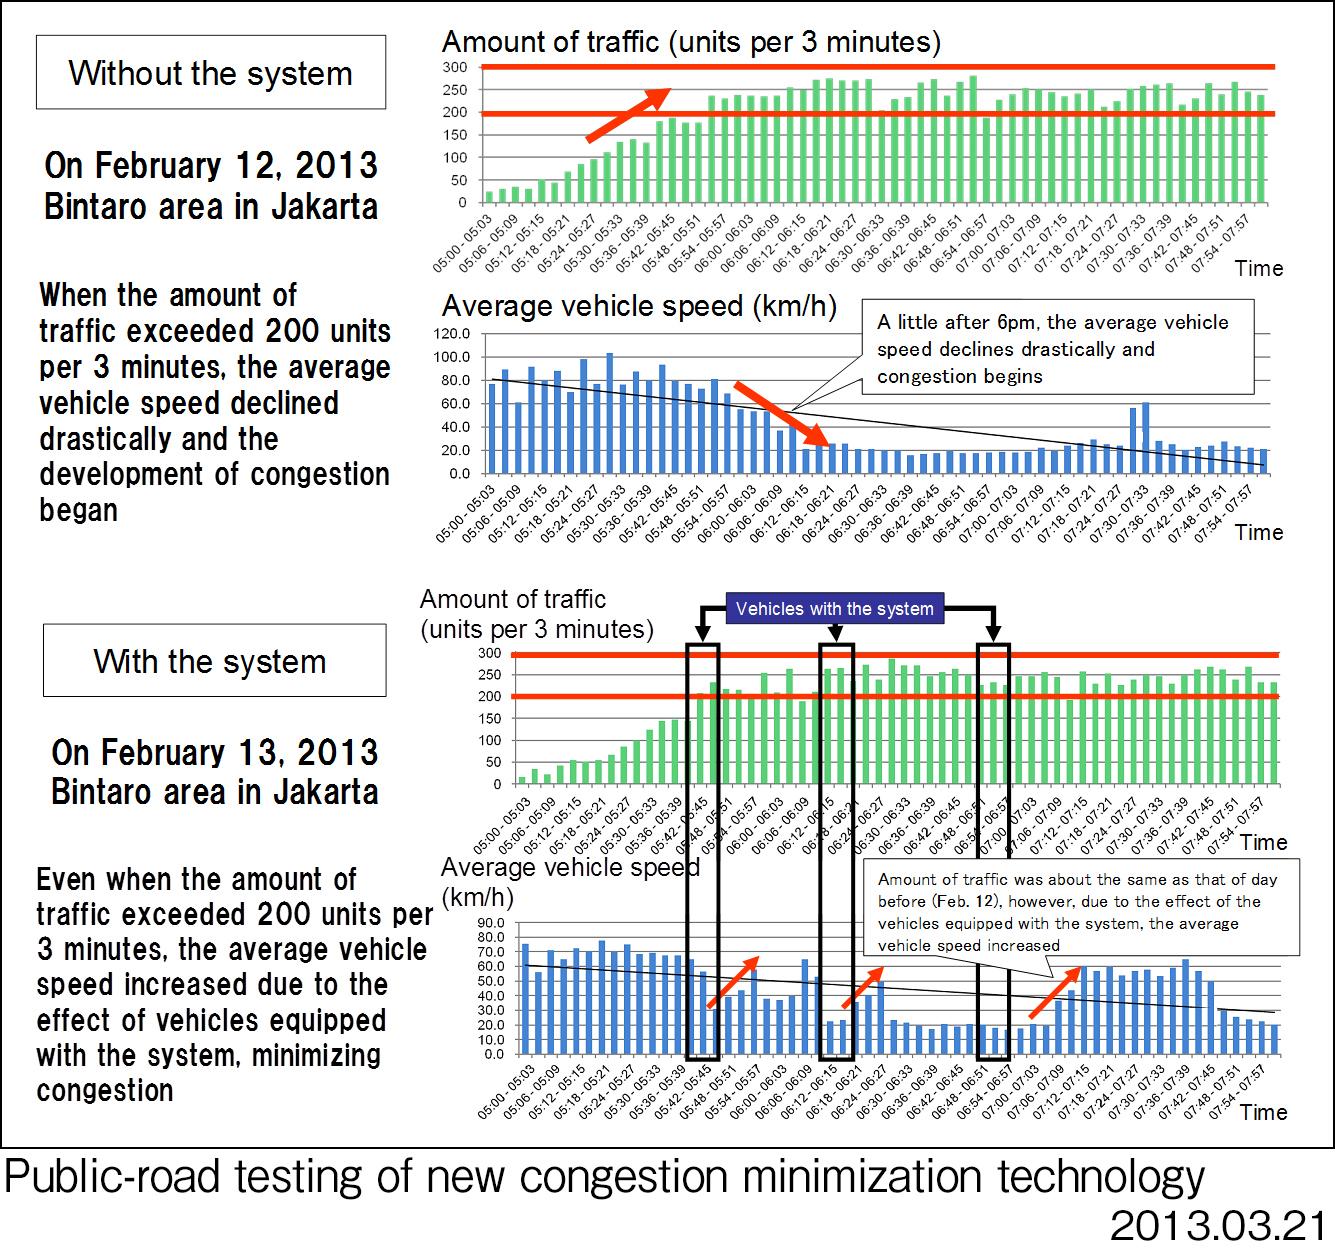 Honda's smartphone anti-congestion system